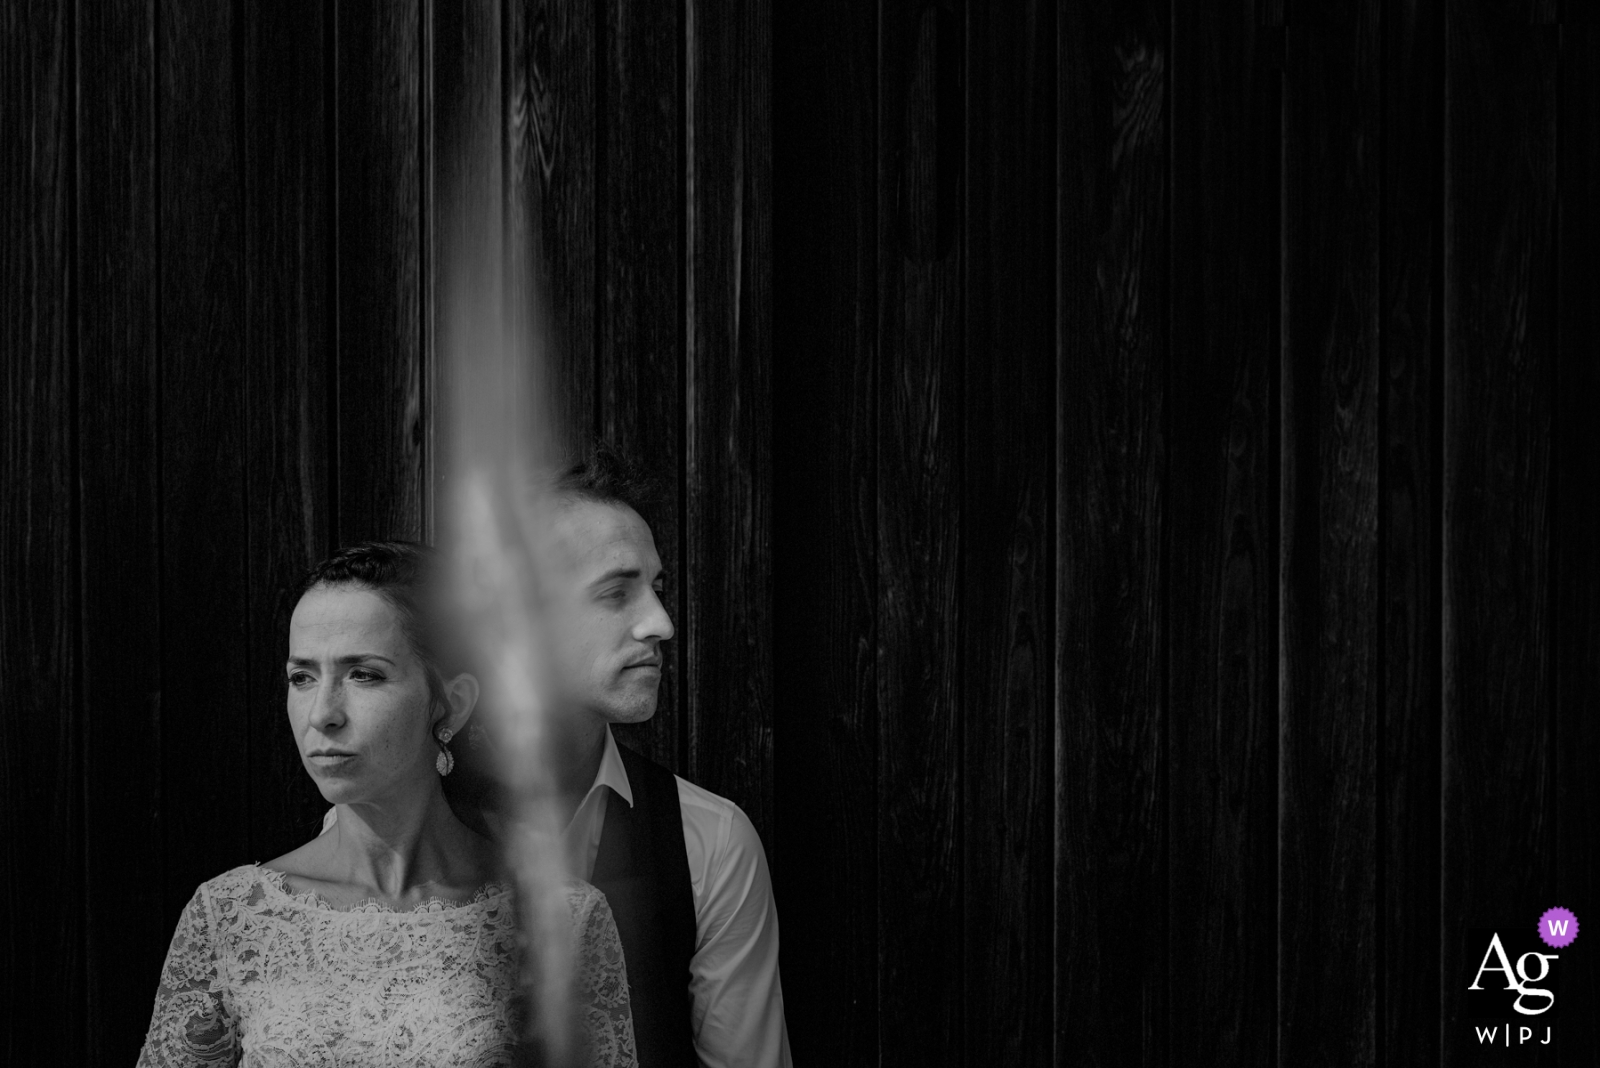 Mi Castillo de Arena, Araba, Spain couple posing for black and white wedding portrait